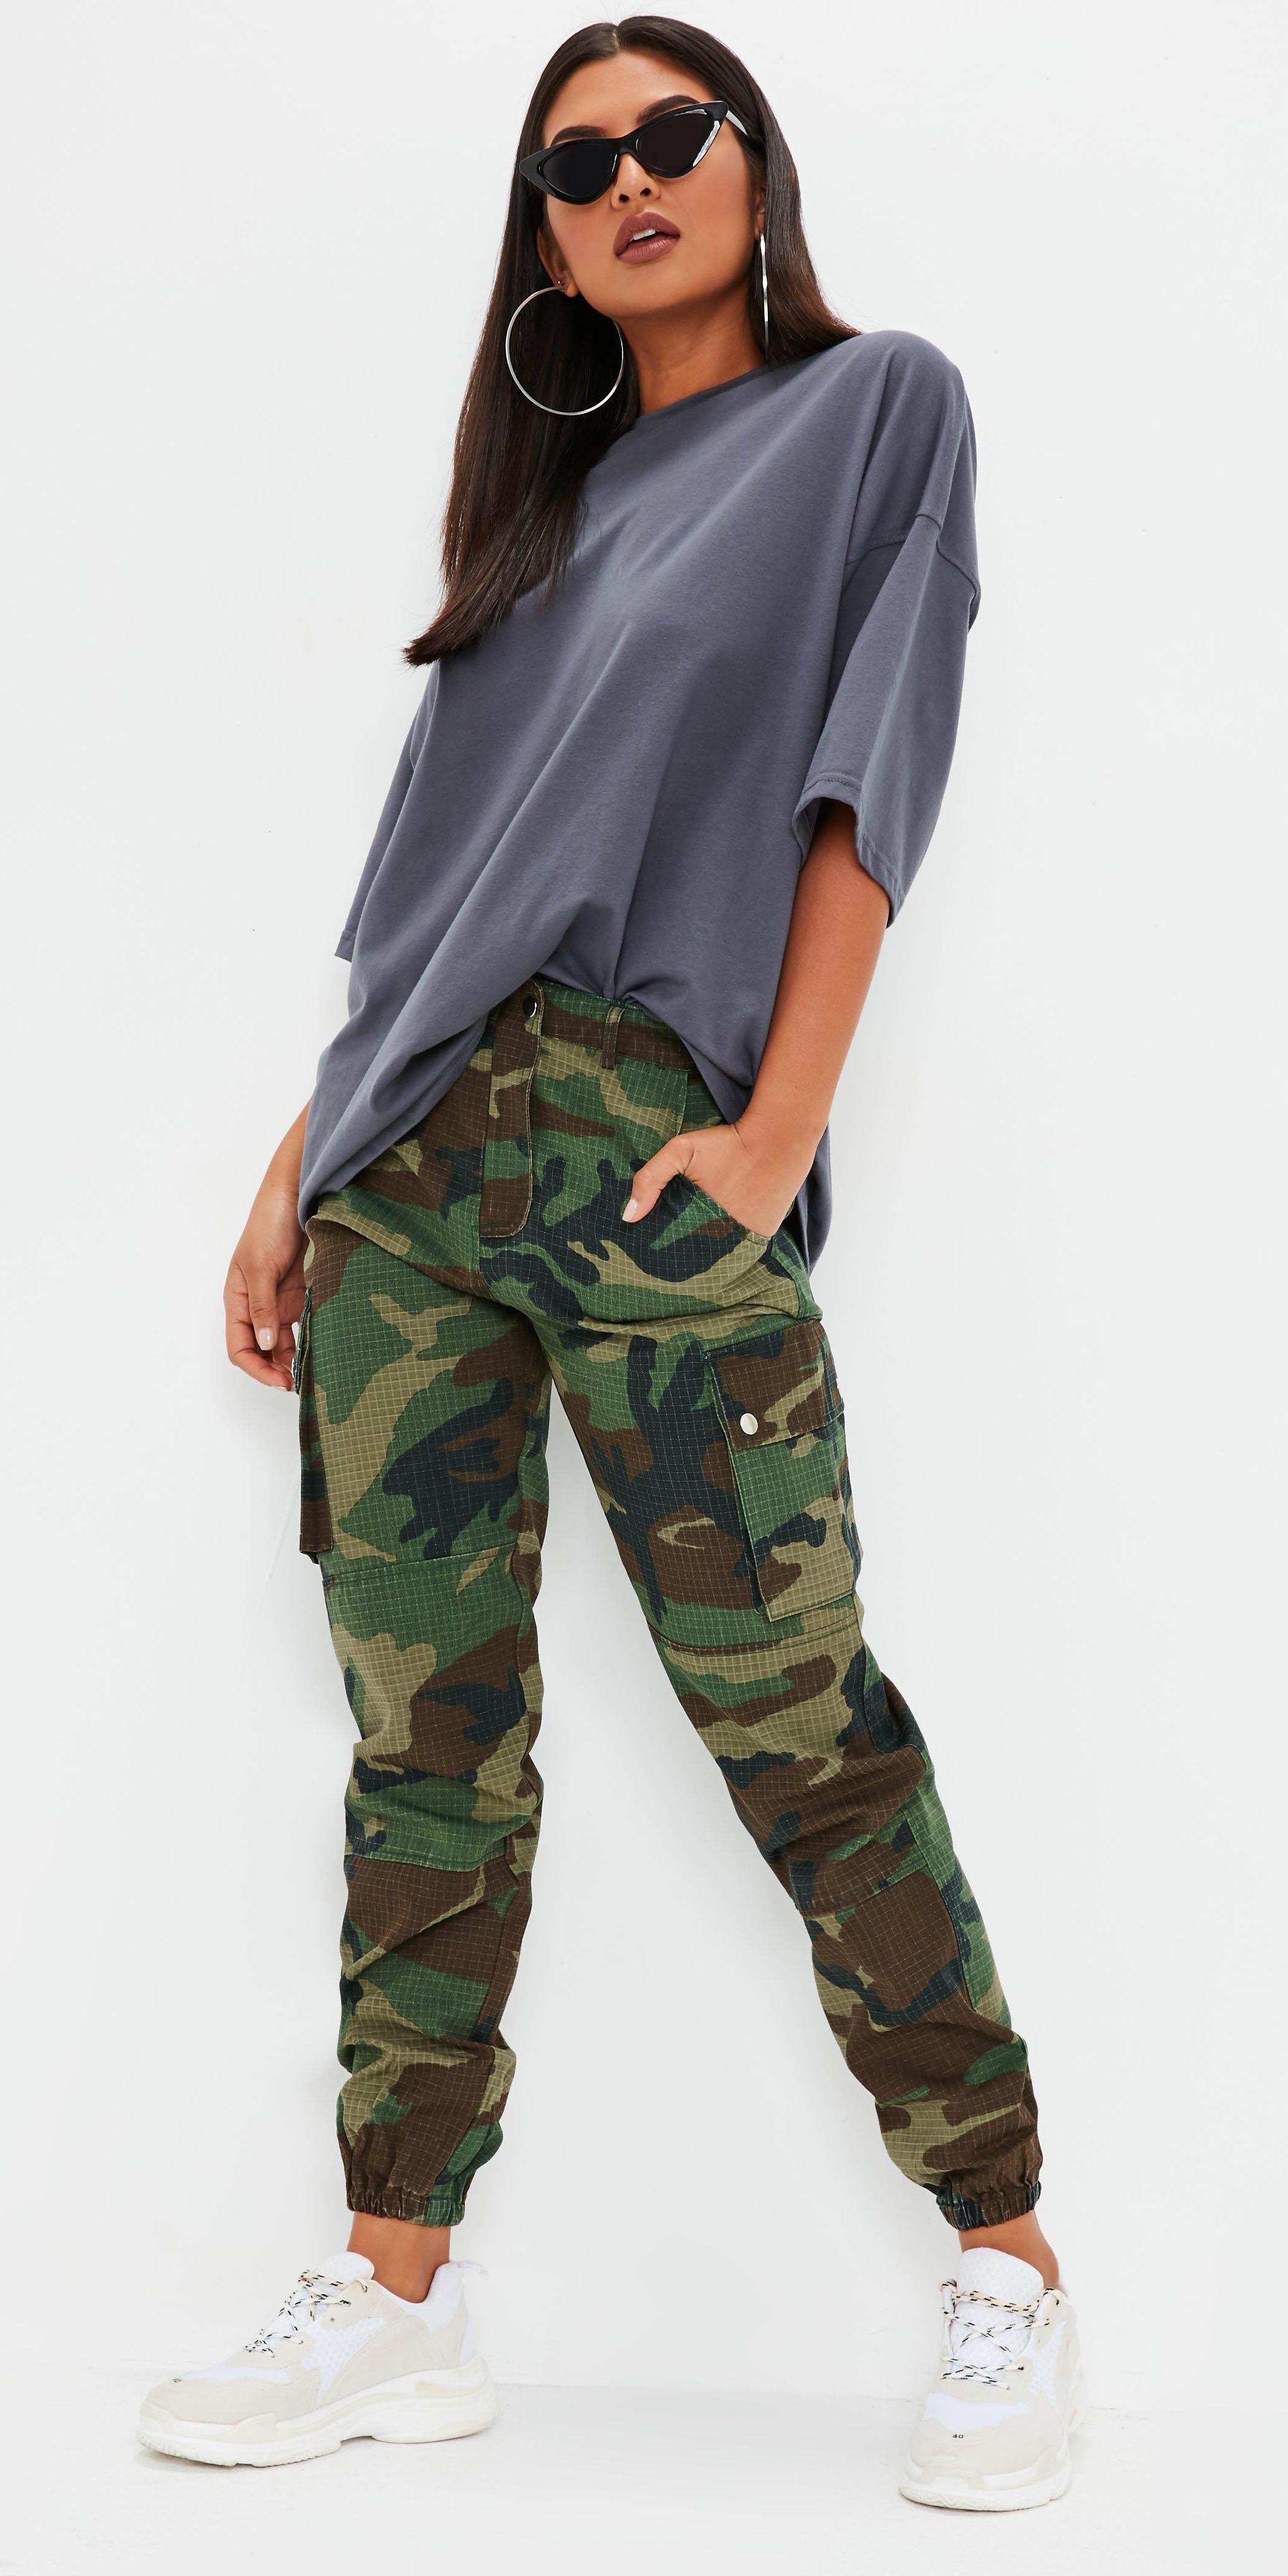 green-olive-joggers-pants-camo-print-grayd-tee-hoops-sun-brun-white-shoe-sneakers-fall-winter-weekend.jpg